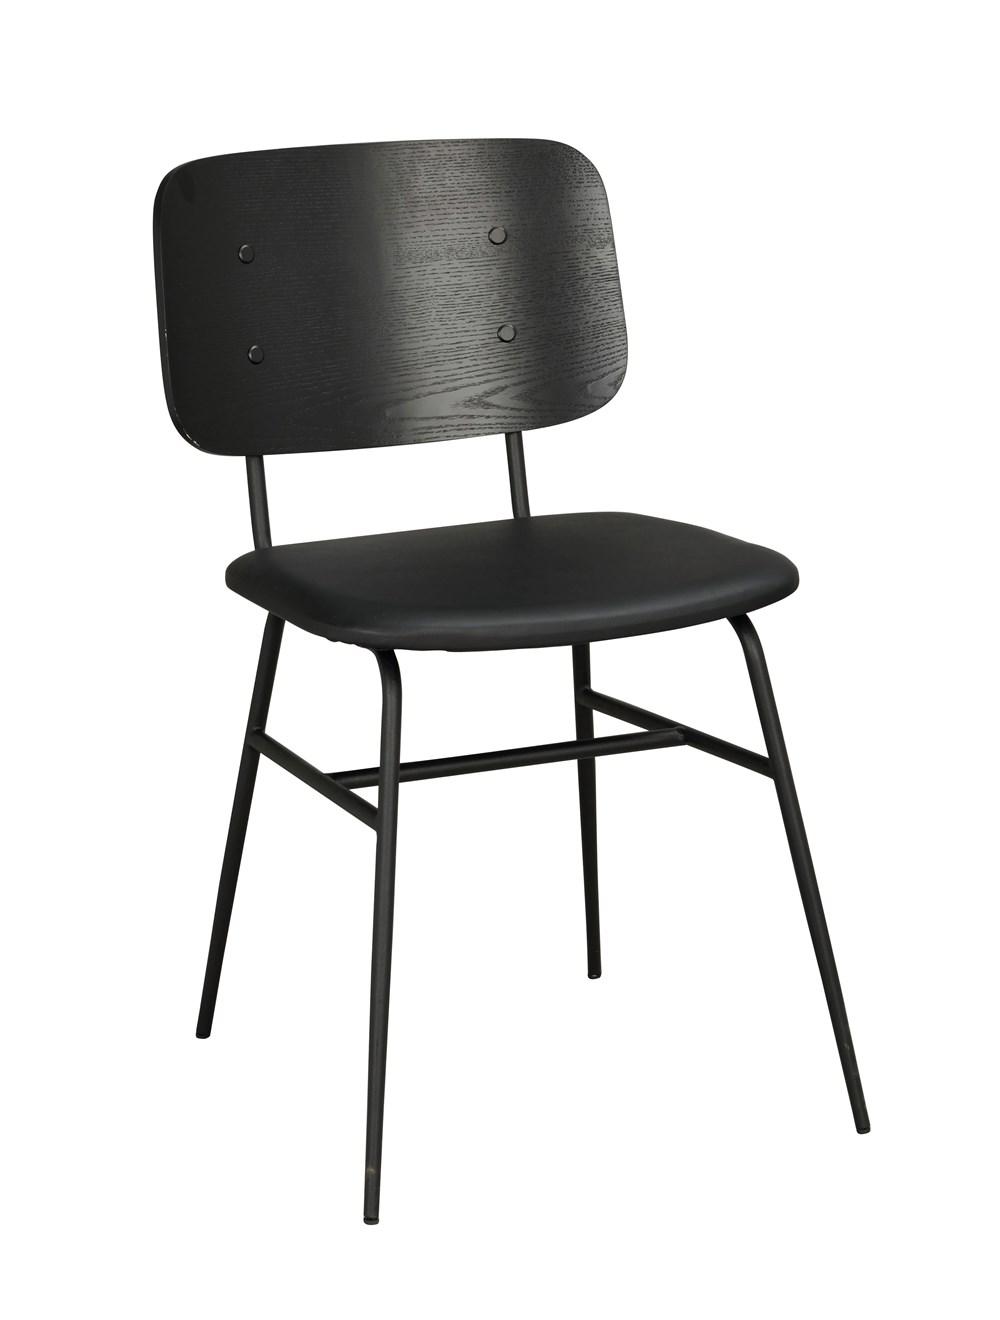 Brent tuoli musta, Rowico